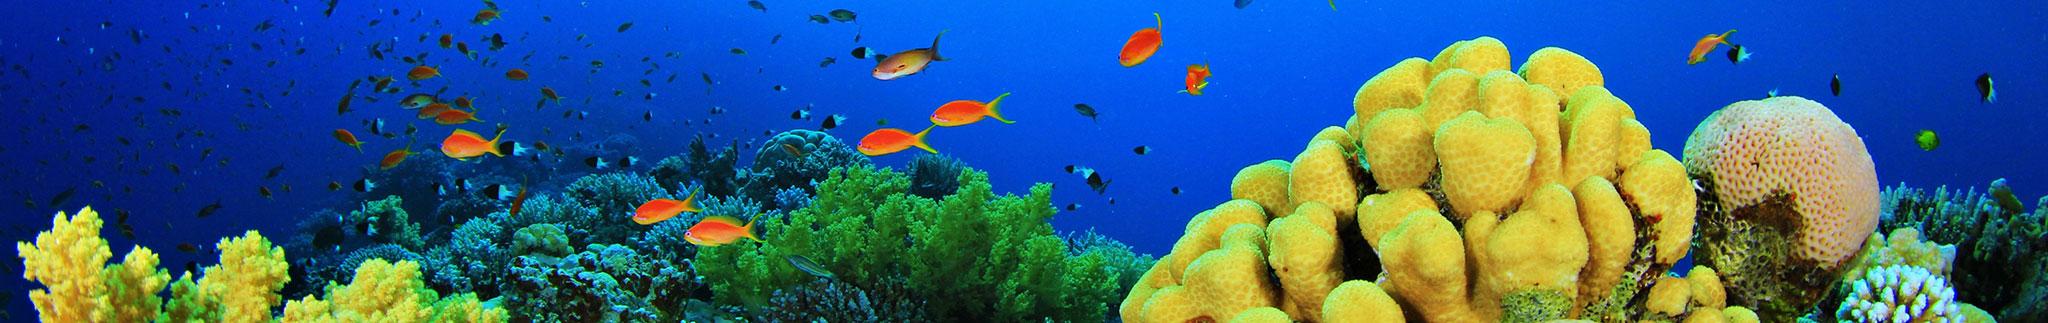 Aquarium Shop: Aquaristik Zubehör günstig, Bild 3